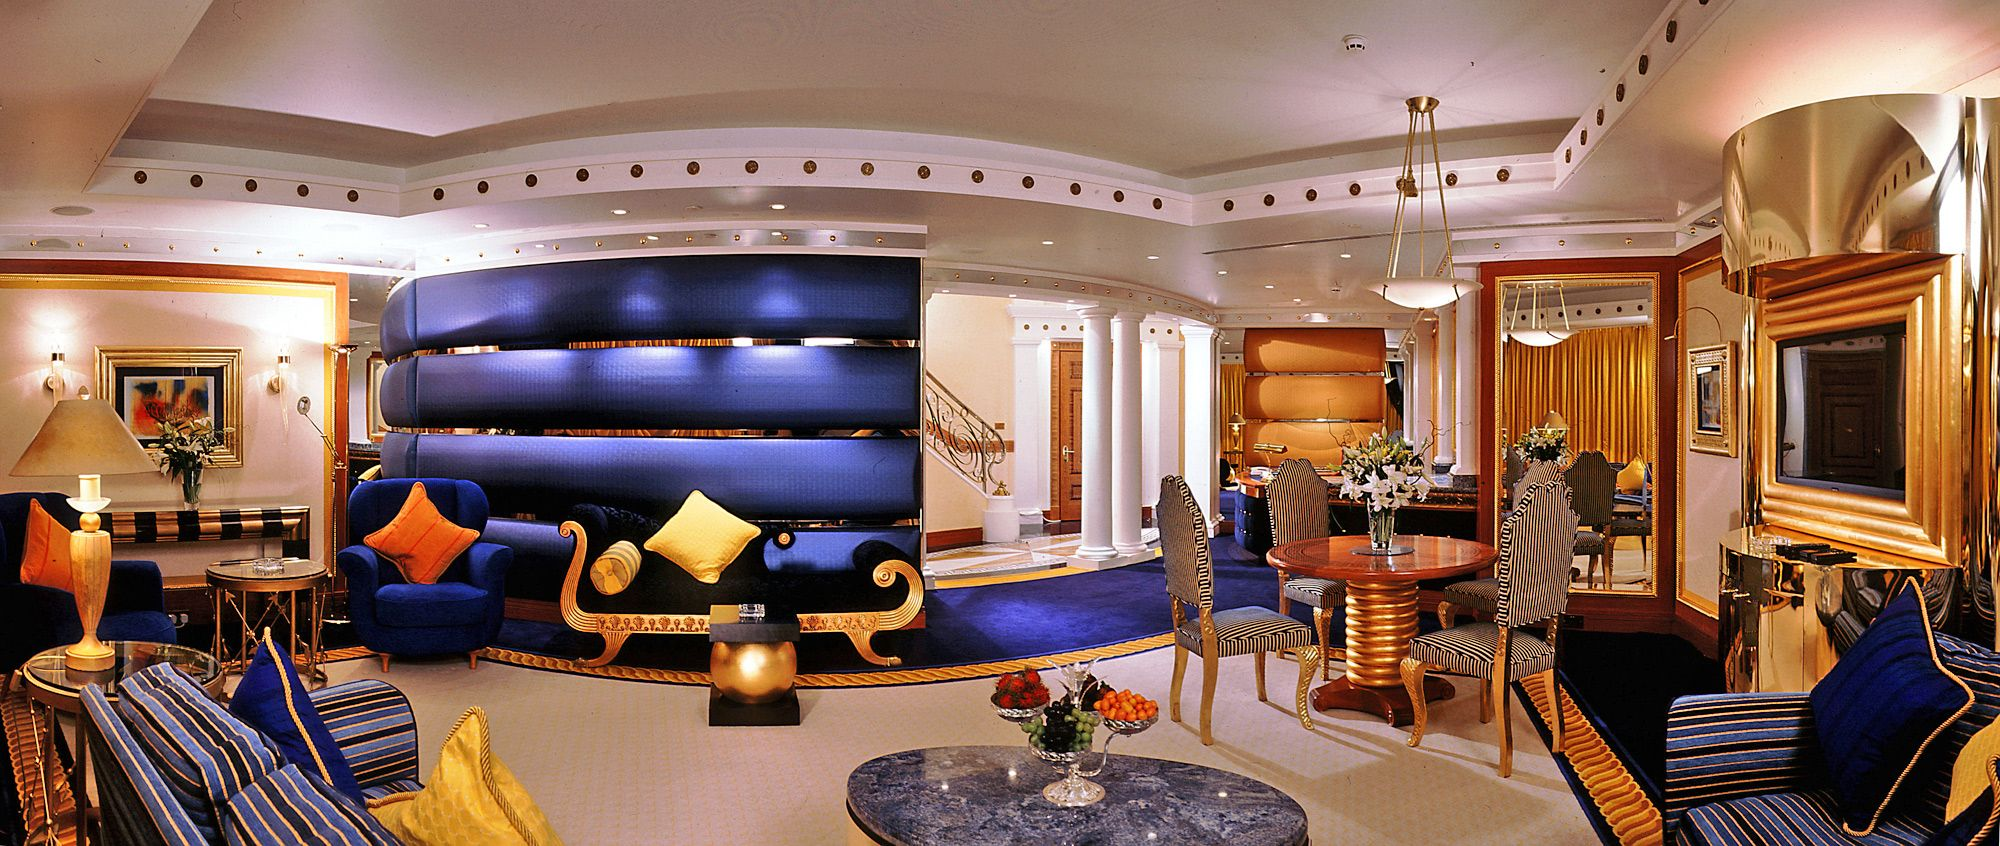 Burj Al Arab The World S Only 7 Star Hotel Hotel Interiors Most Luxurious Hotels Dubai Hotel